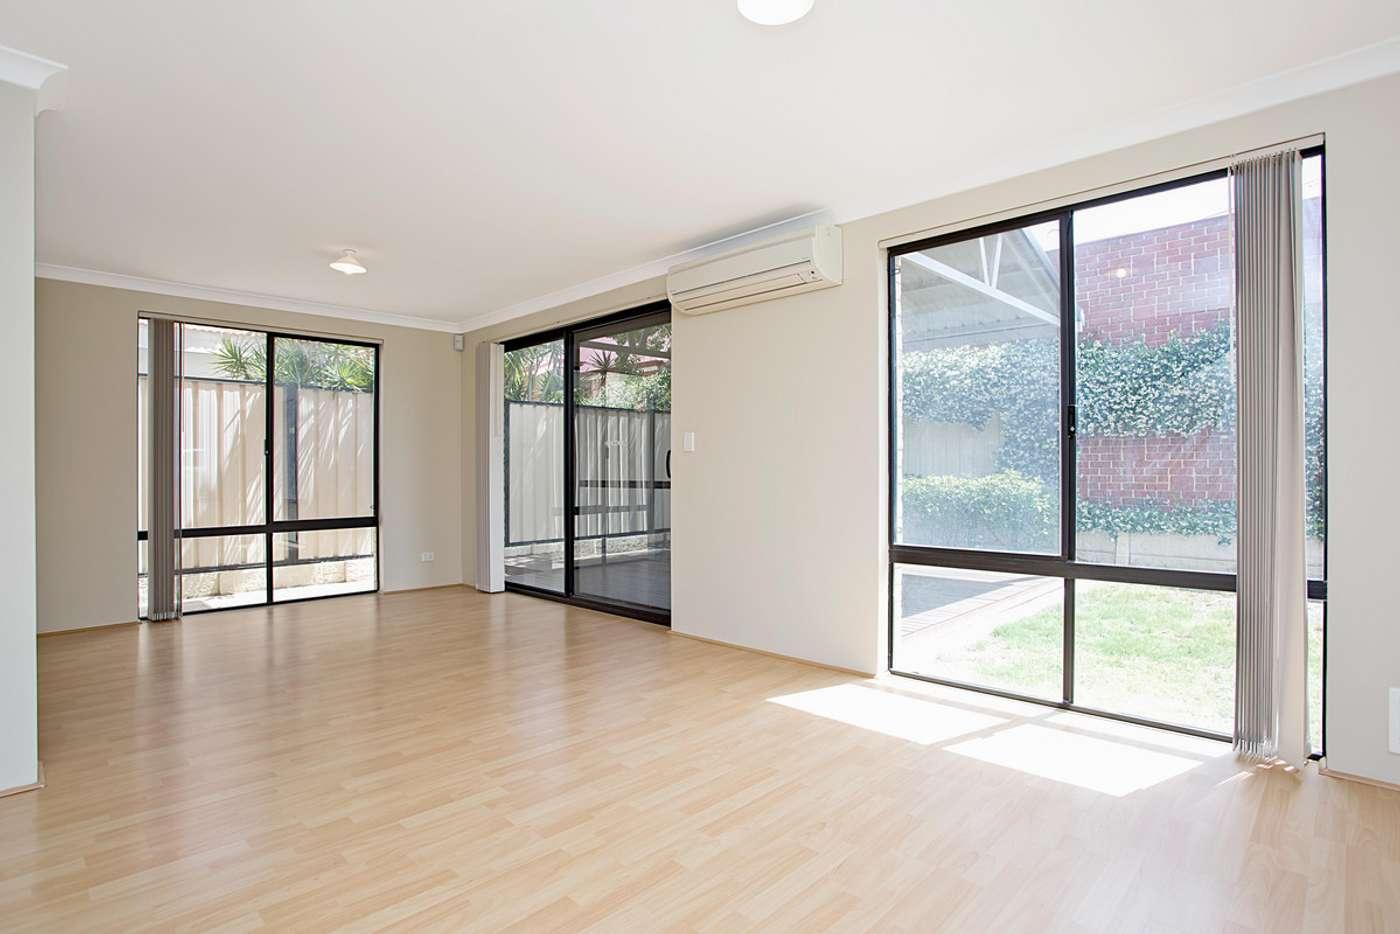 Main view of Homely house listing, 9 Elizabeth Street, Kewdale WA 6105